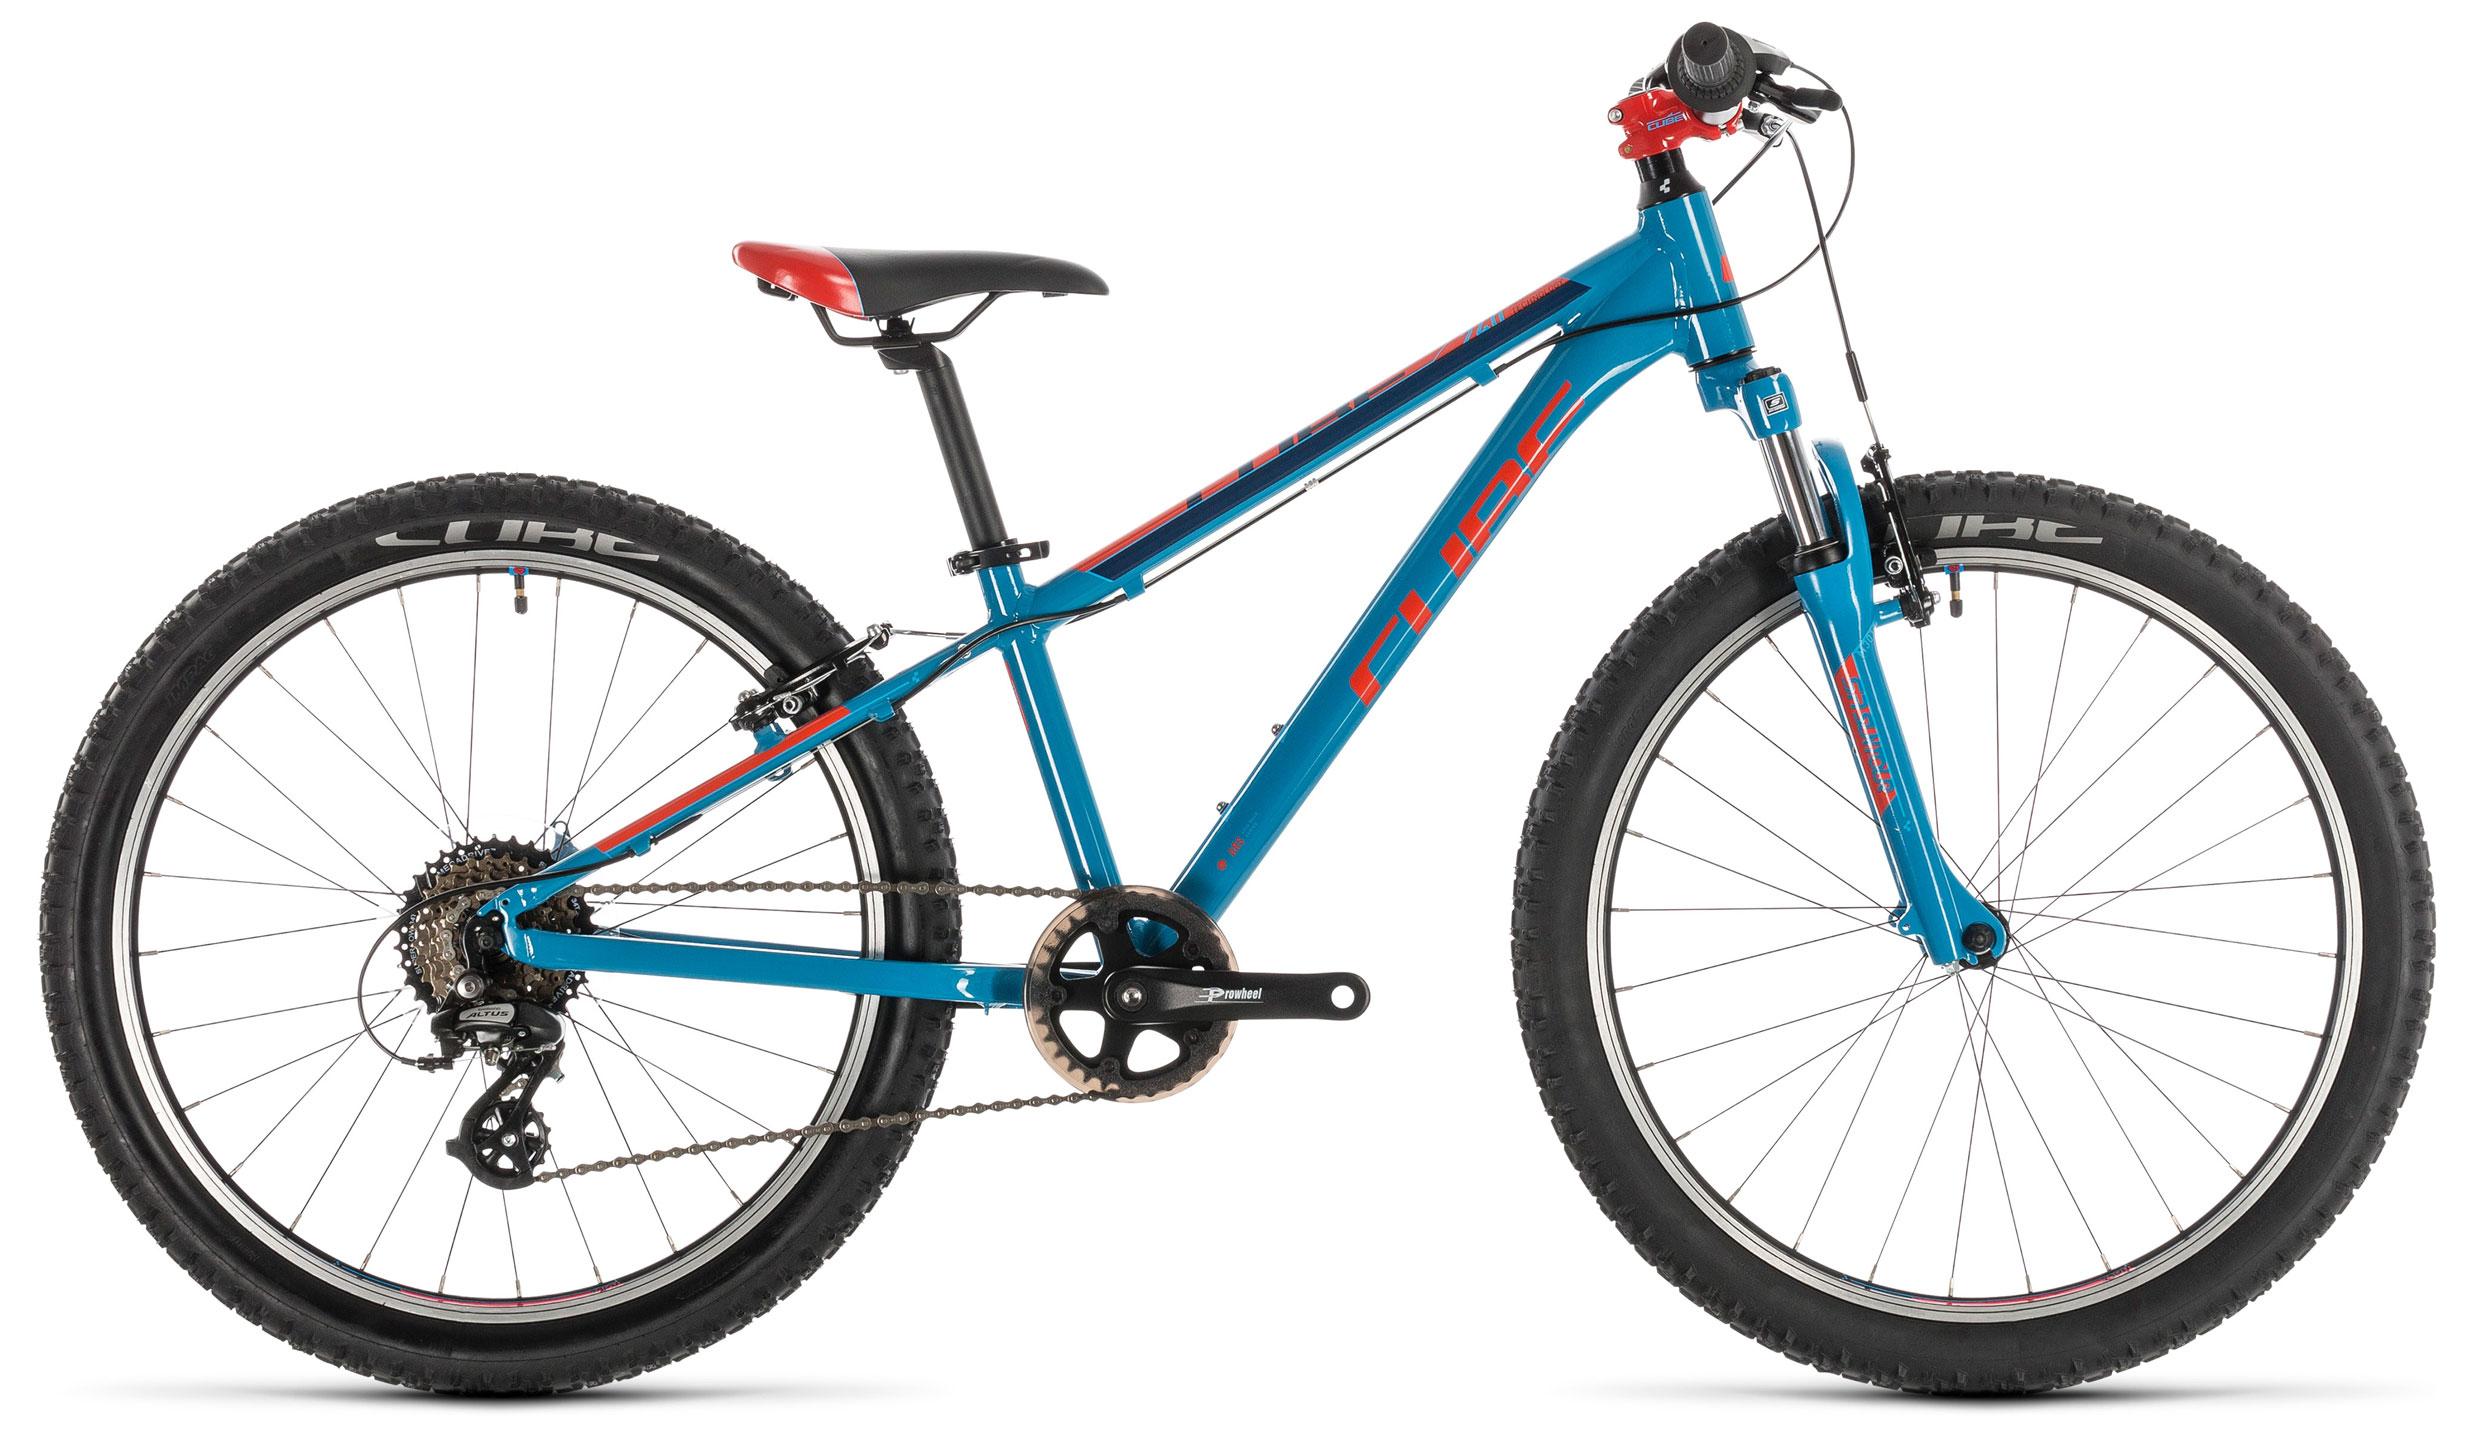 Велосипед Cube Acid 240 2019 велосипед cube nature sl 2018